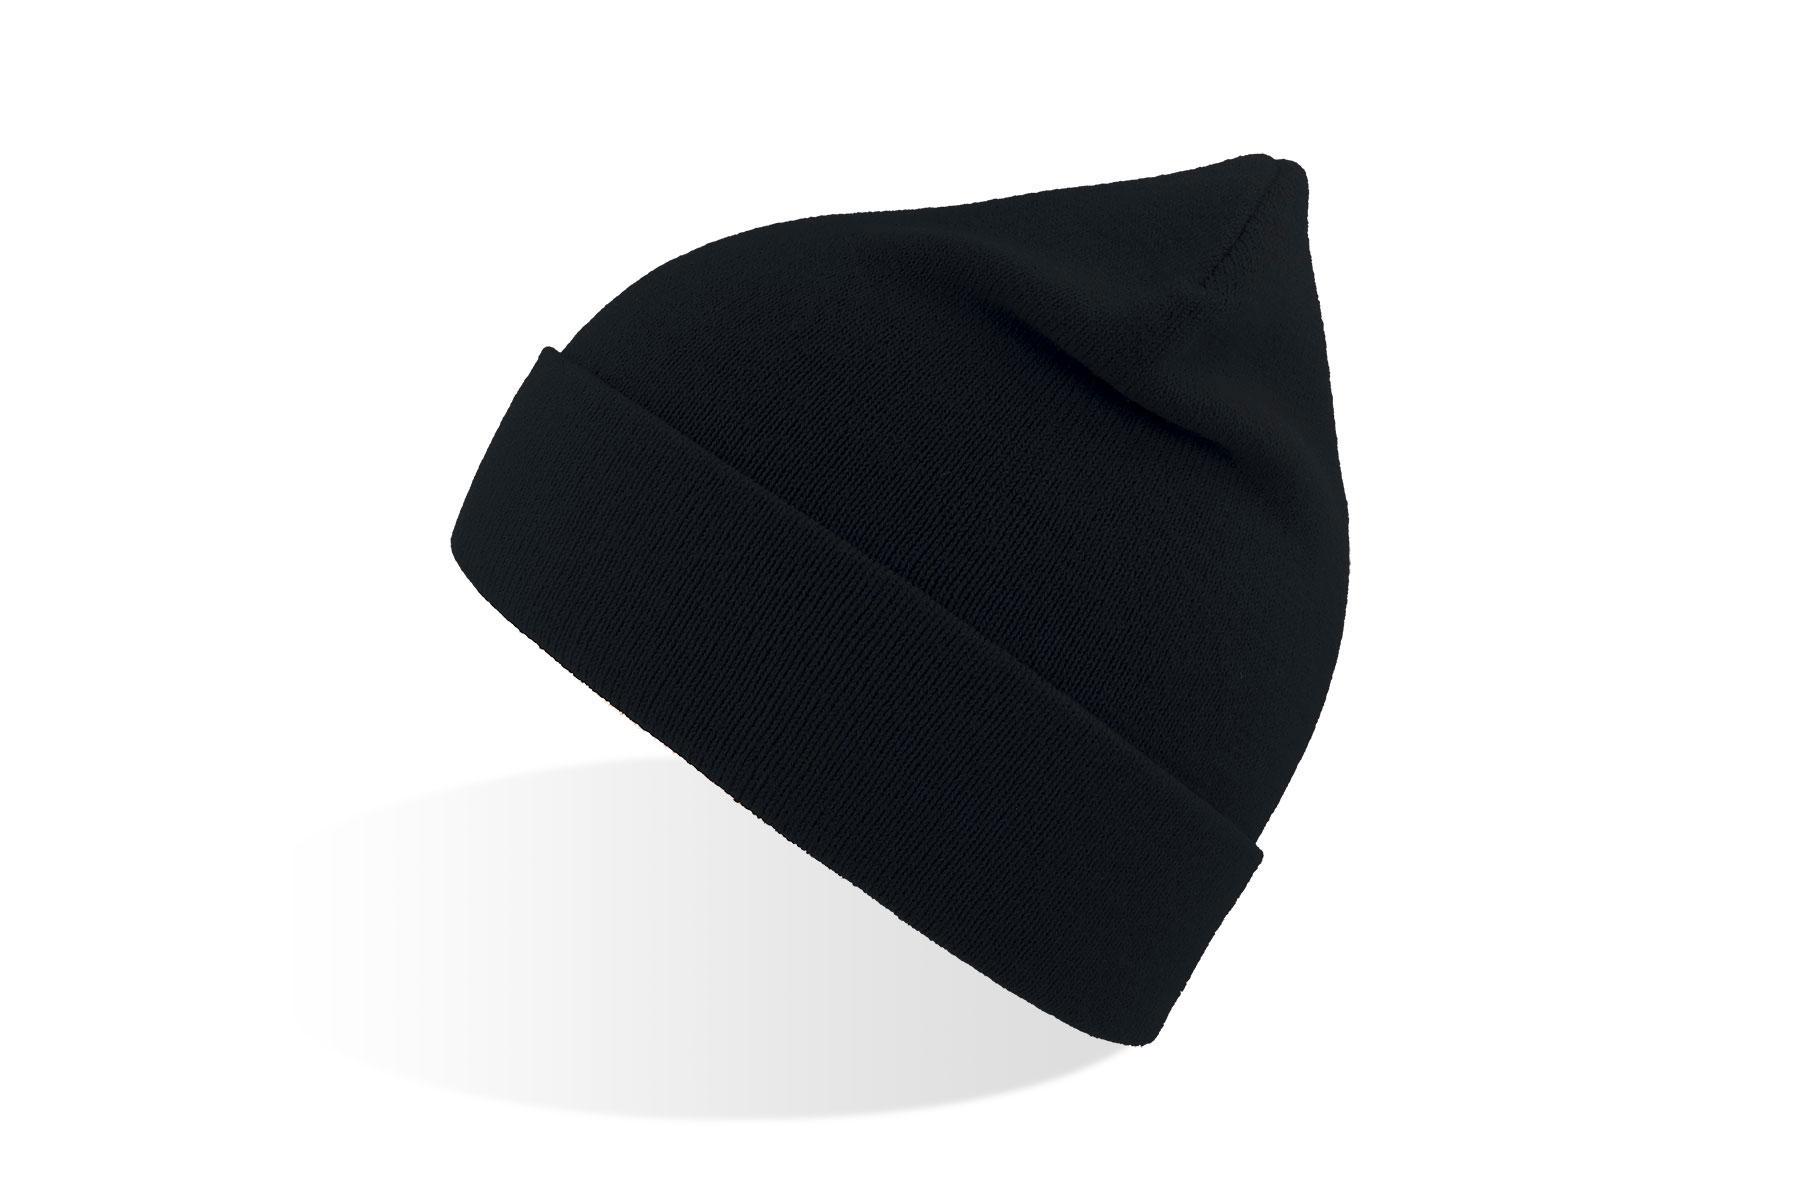 B-Static pipo - NEW 2019 ATLANTIS CAPS & HATS - BSTA - 2